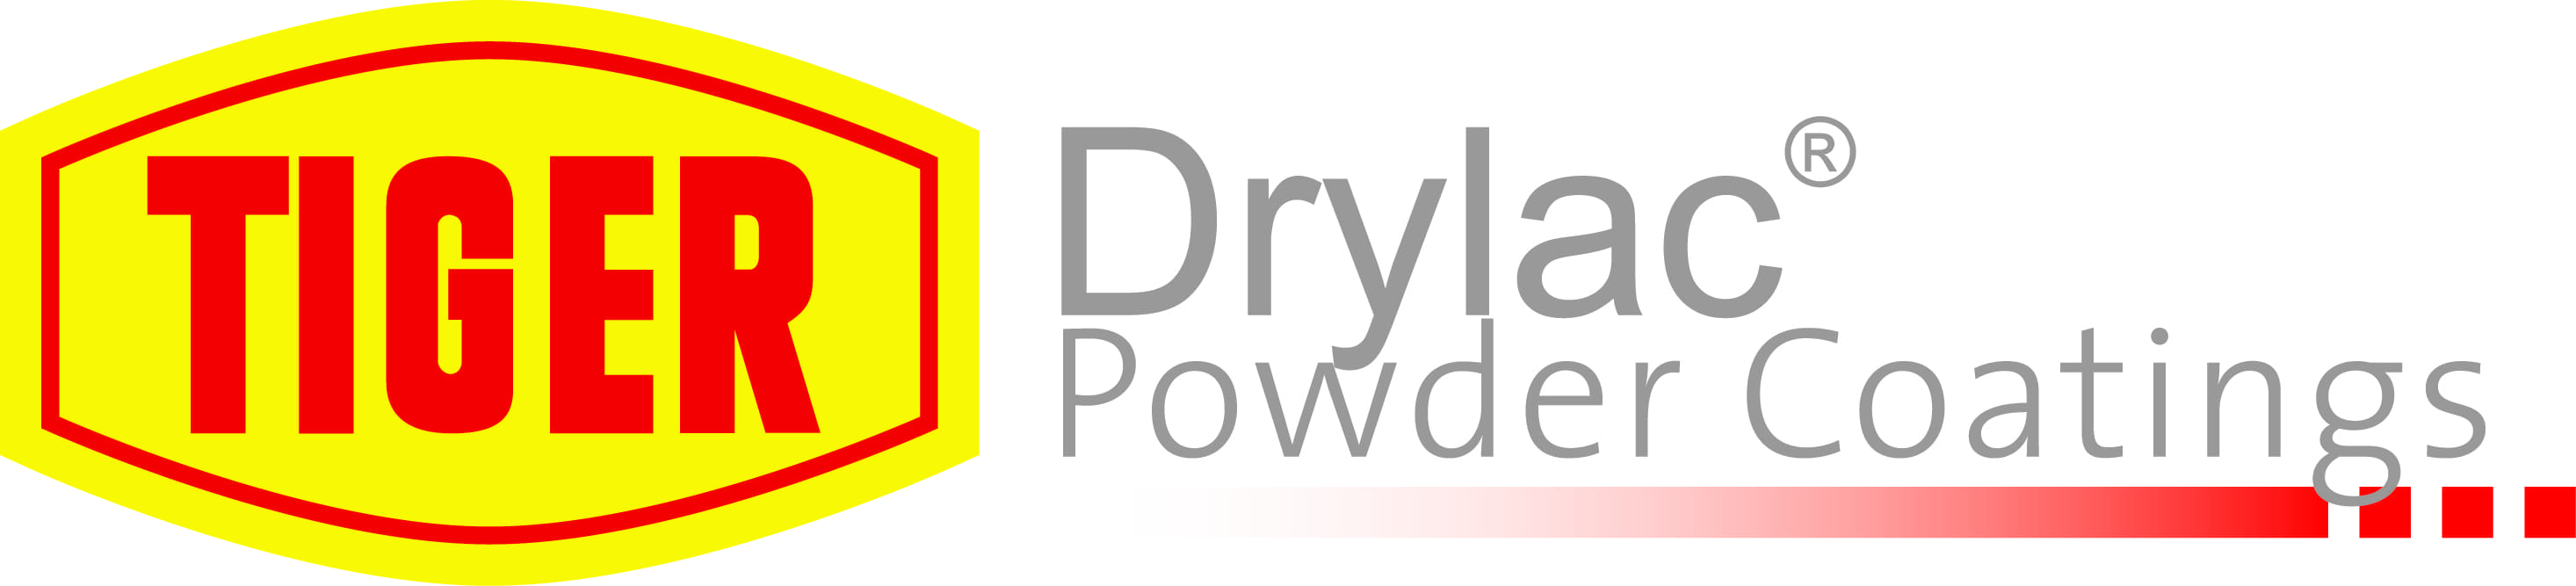 tiger-drylac-coatings-edmonton